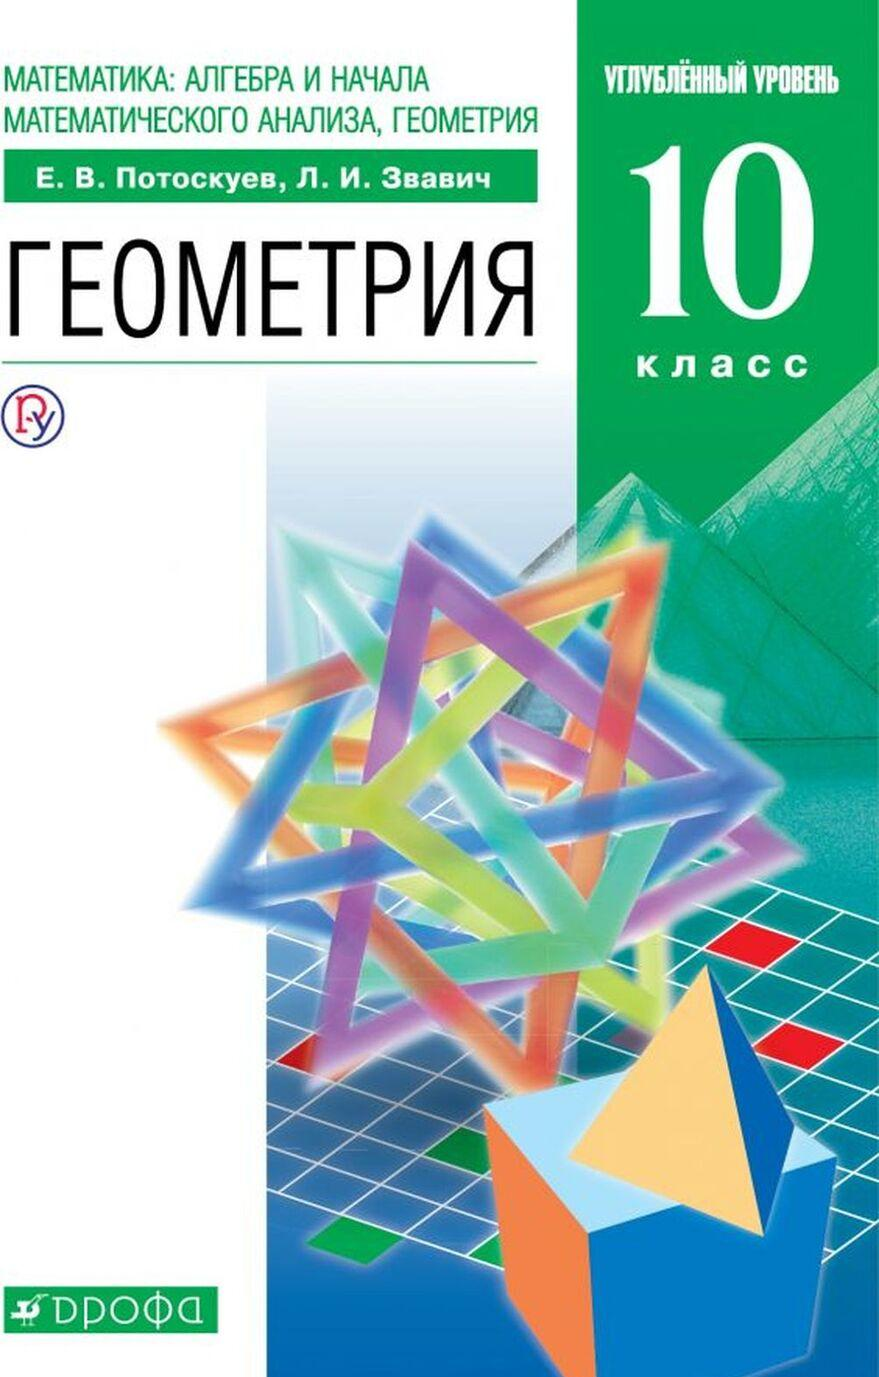 Geometrija. 10 klass. Uchebnik (+ Zadachnik) | Potoskuev Evgenij Viktorovich, Zvavich Leonid Isaakovich